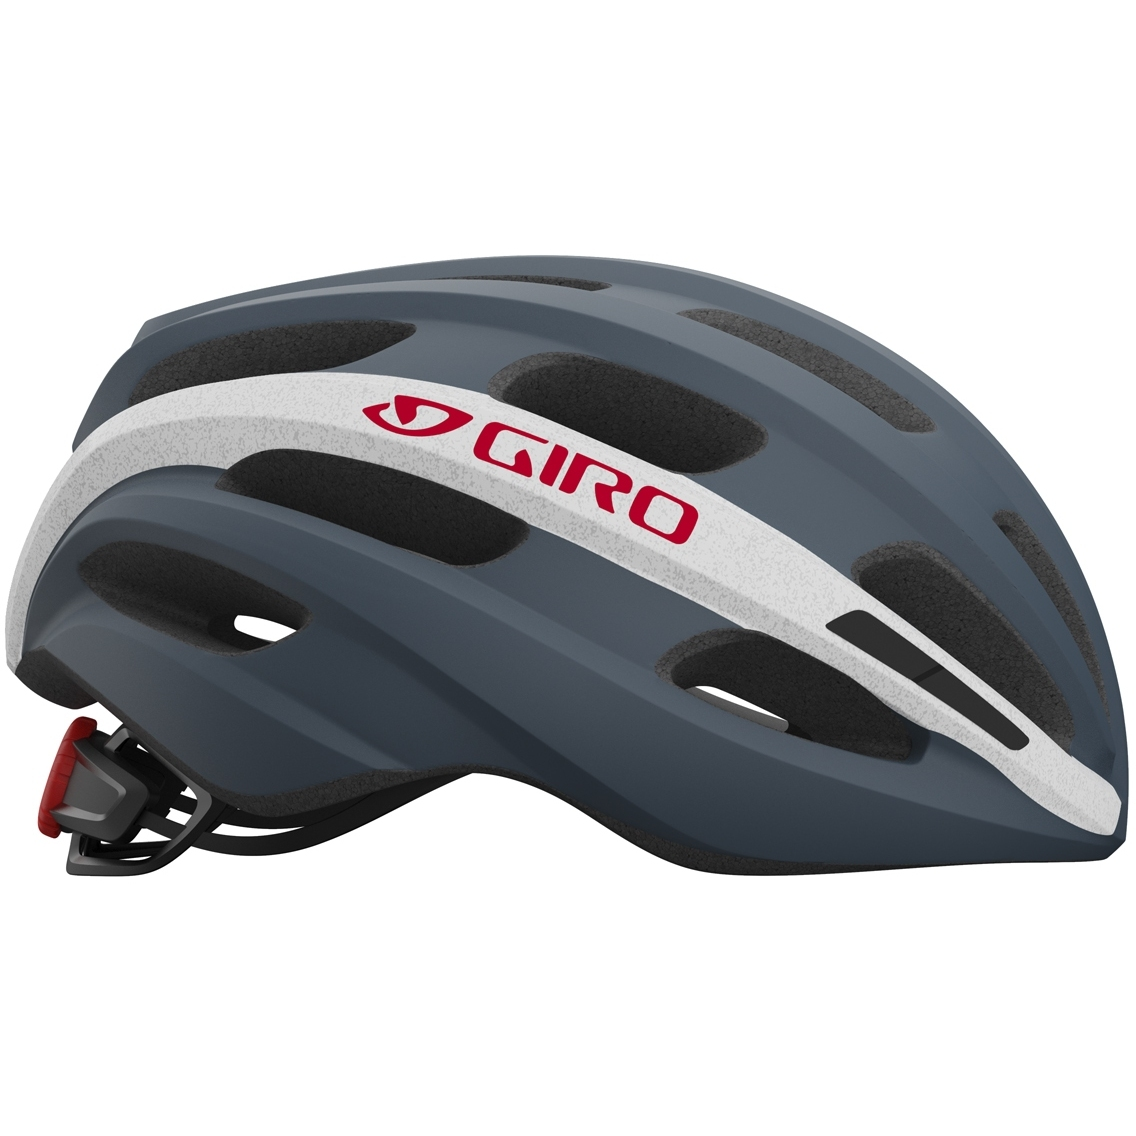 Capacete Ciclismo Giro Isode Cinza Branco Vermelho